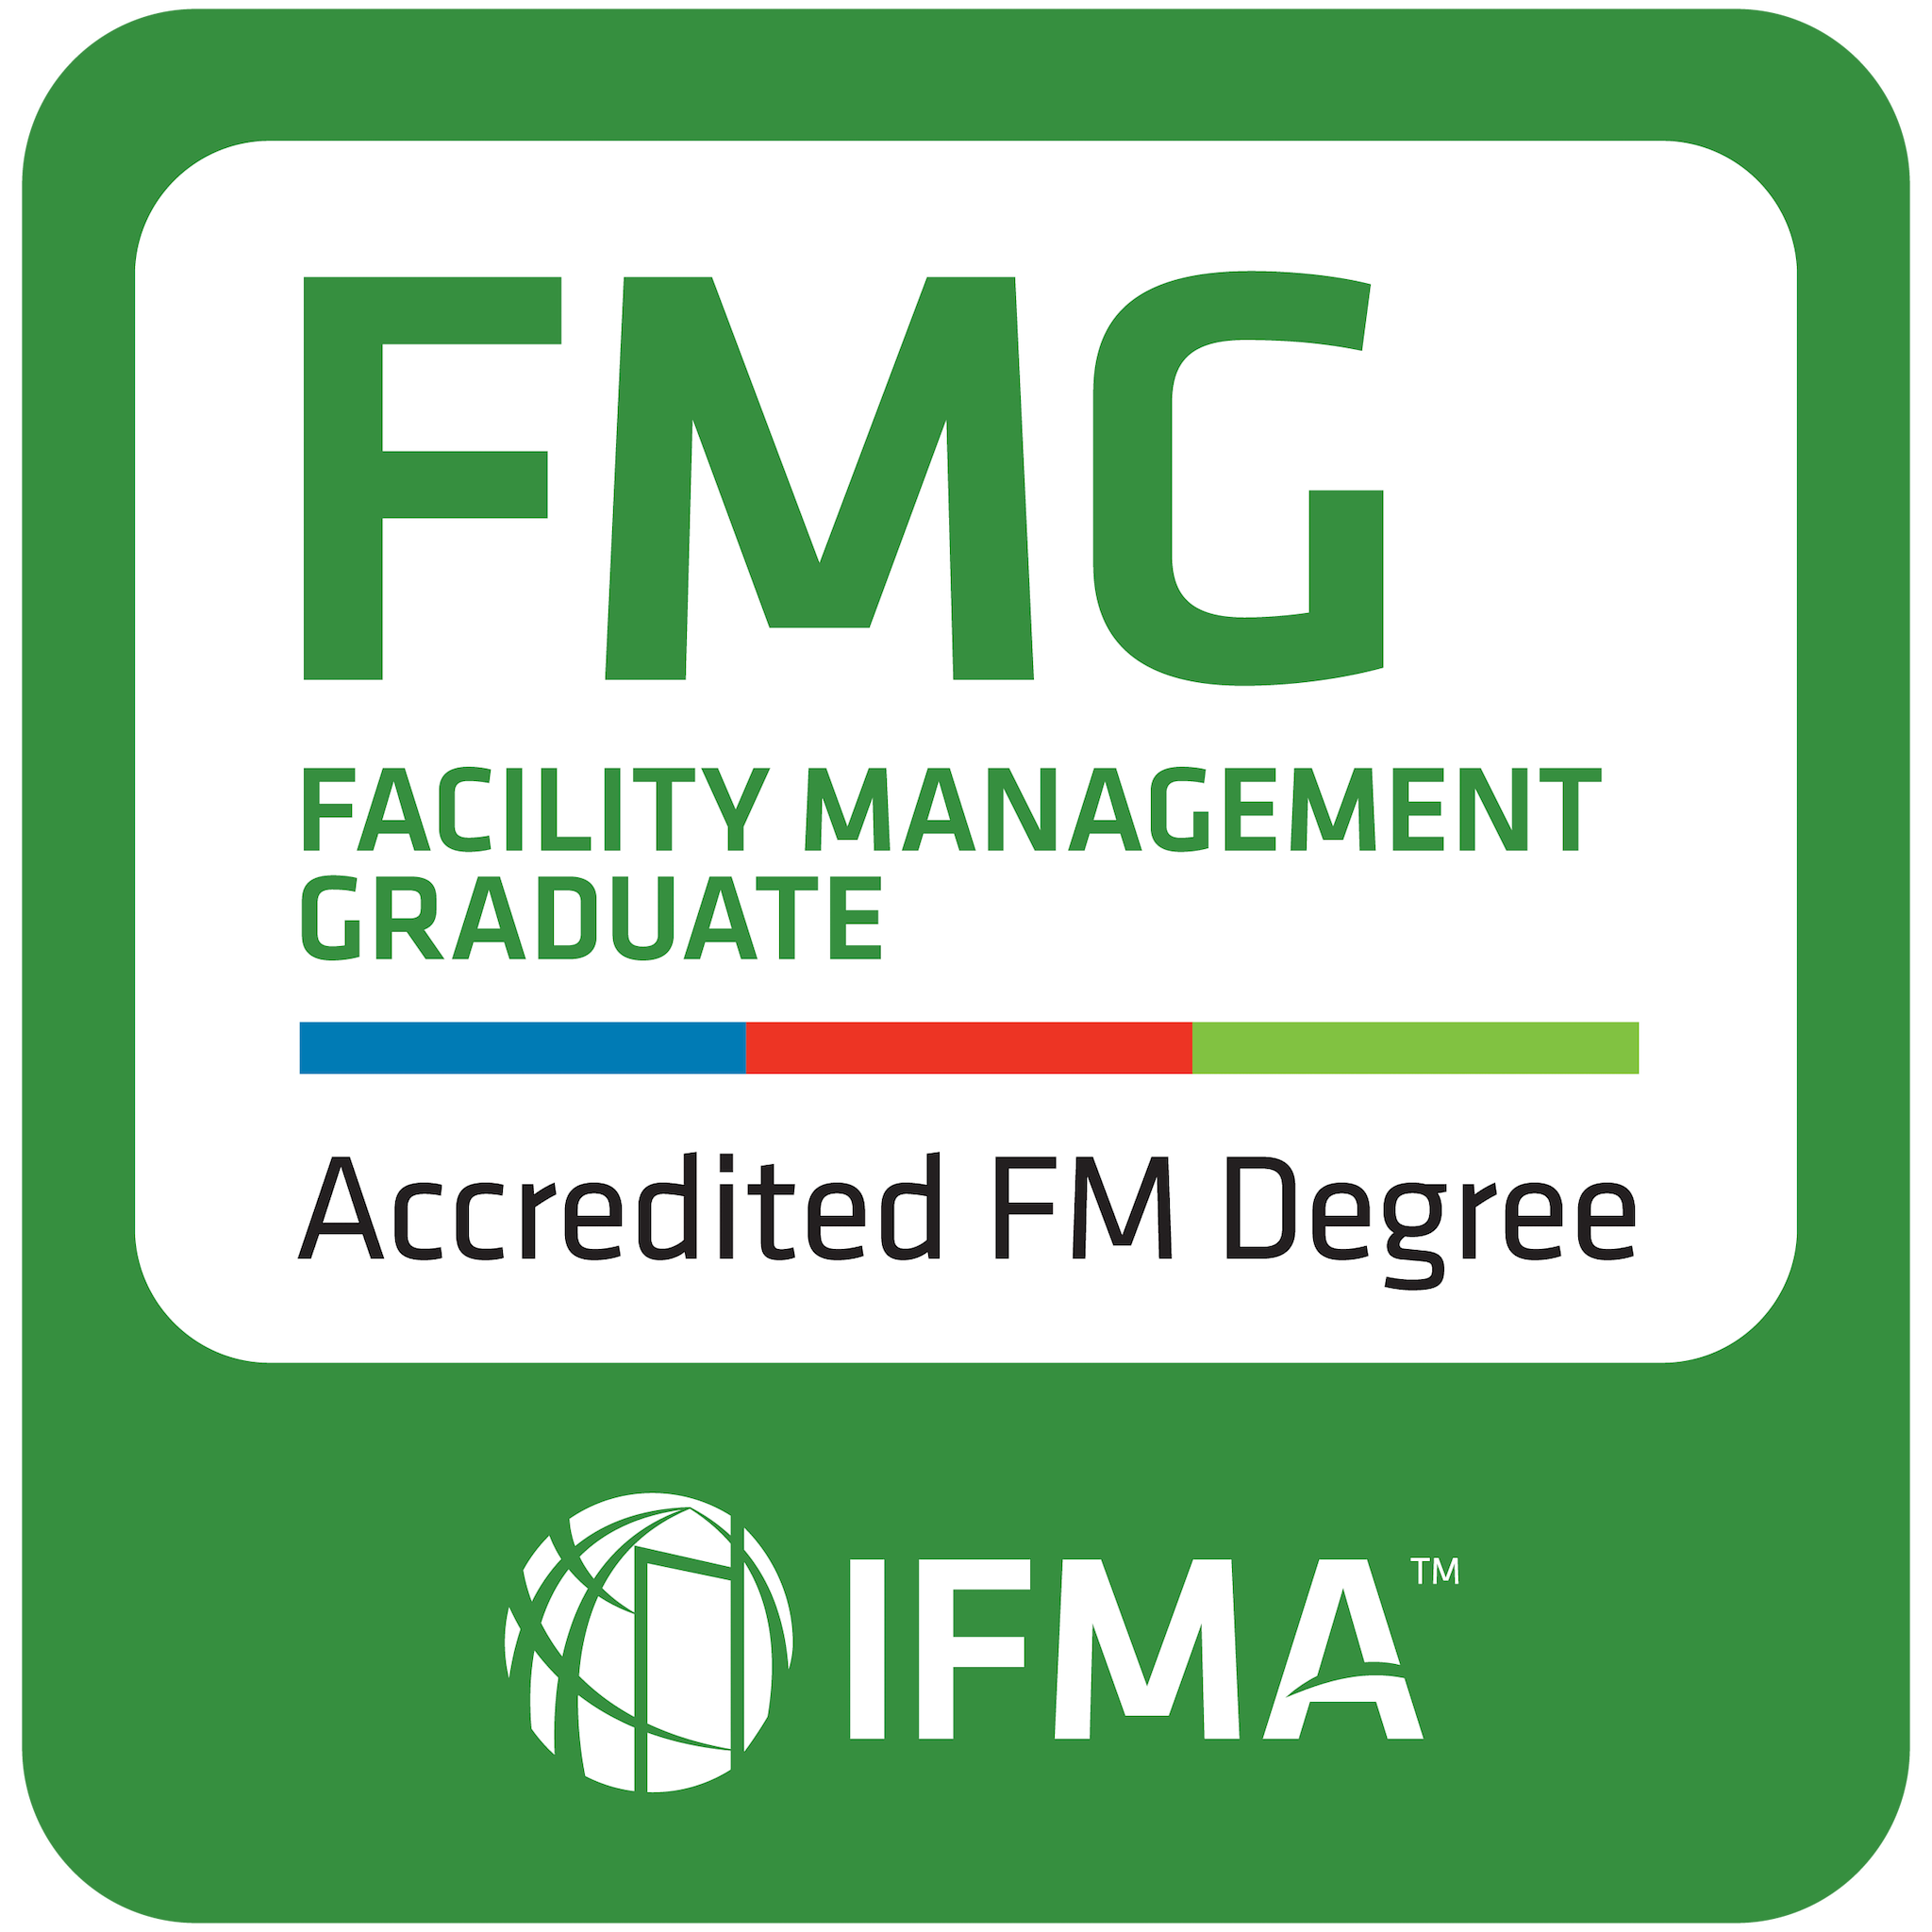 Facility Management Graduate (FMG)